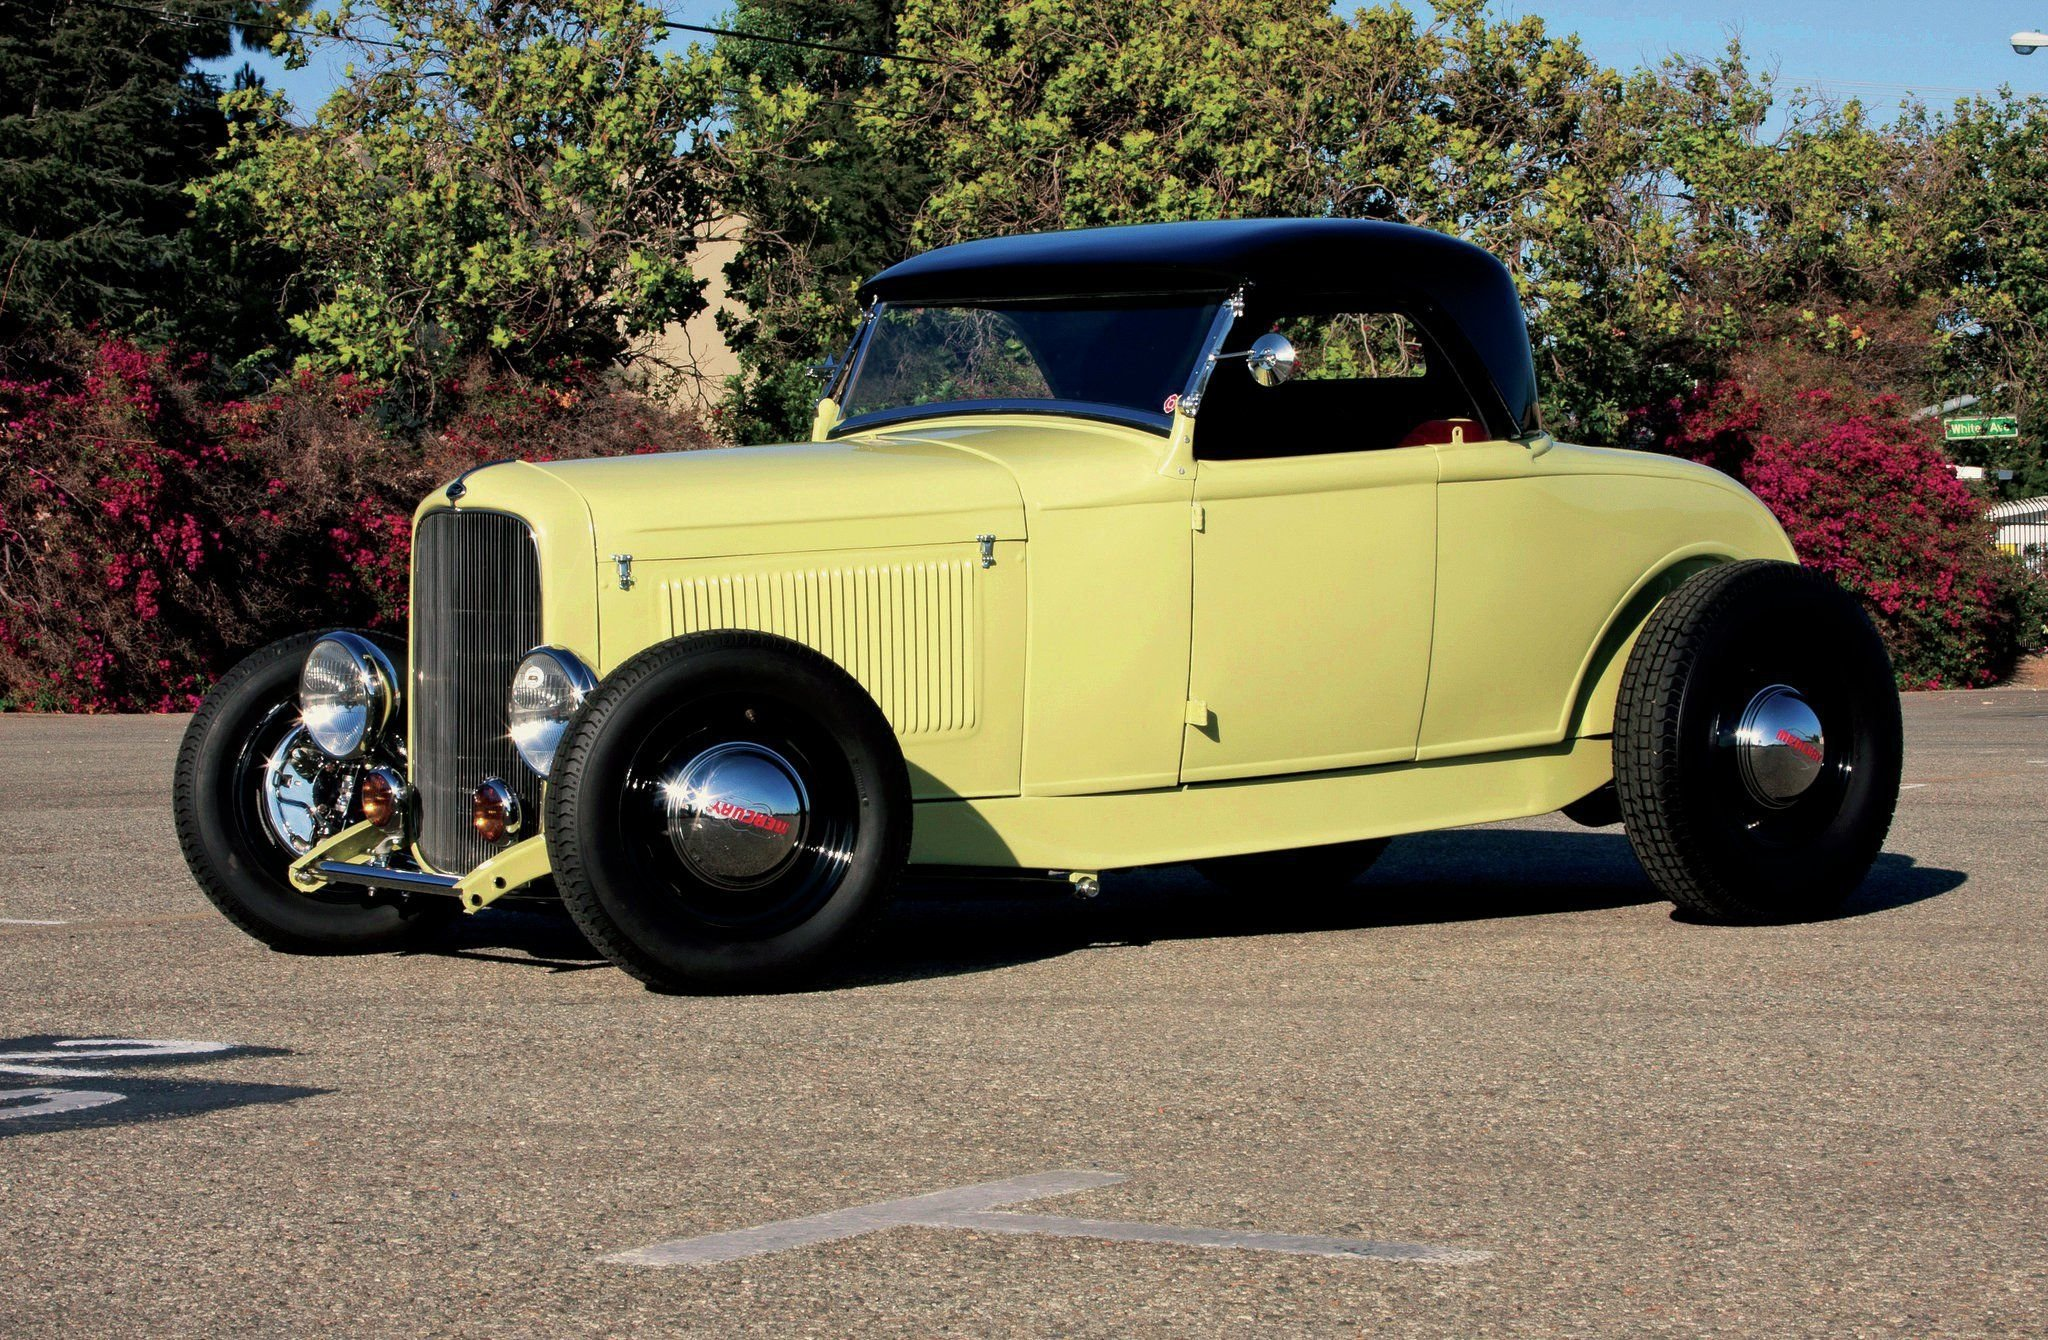 1931 Ford Model A Roadster-01 wallpaper